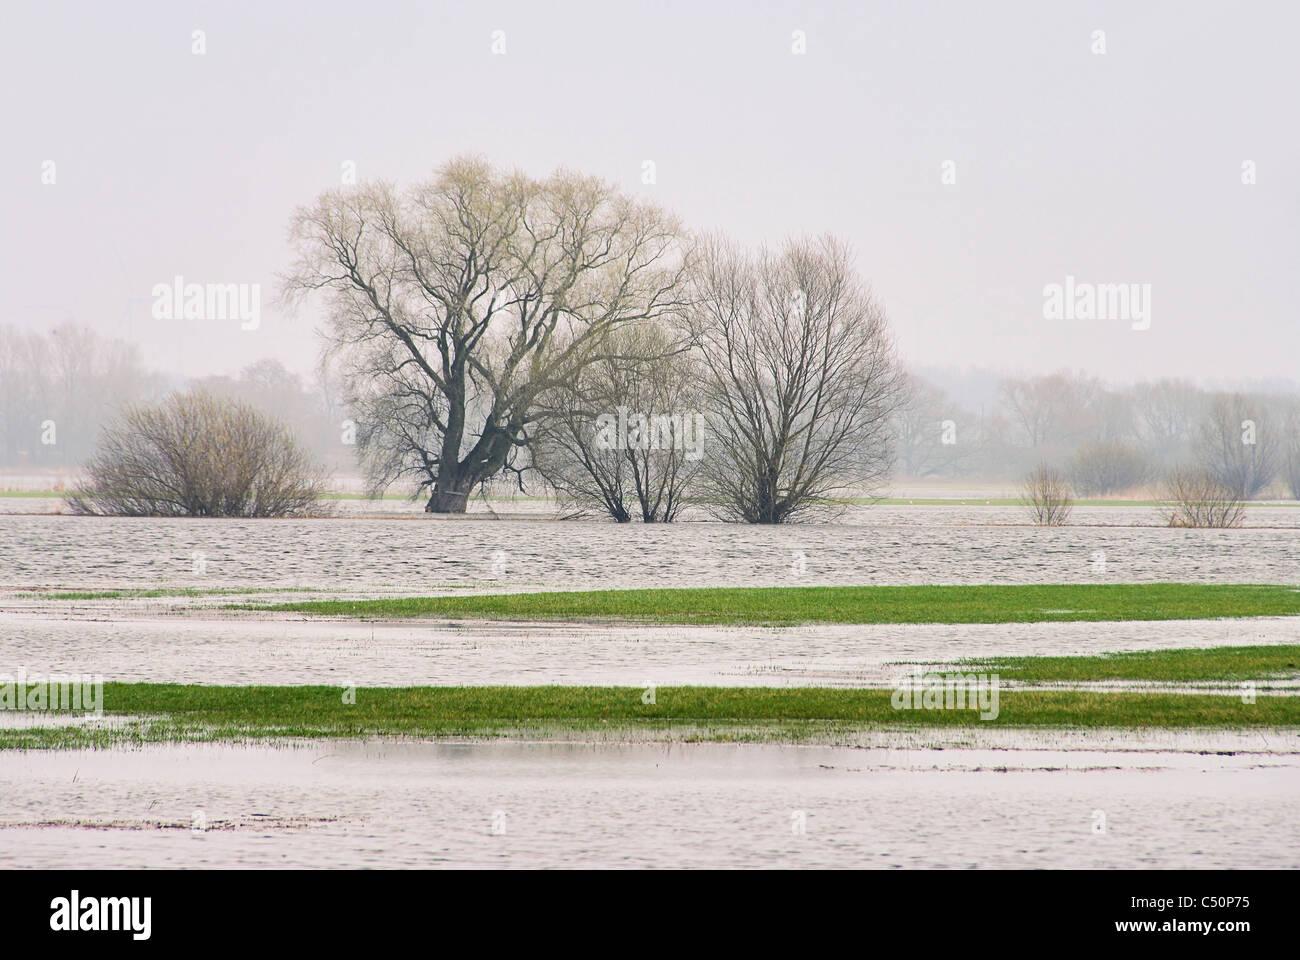 Elbe Hochwasser - river Elbe flood 01 - Stock Image